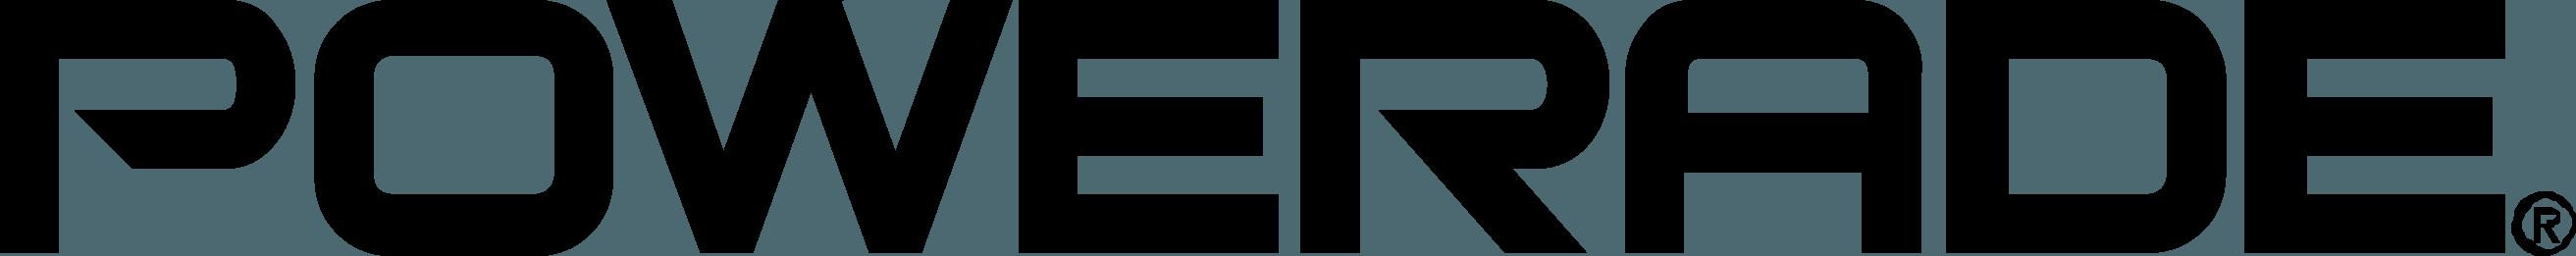 Powerade Logo png